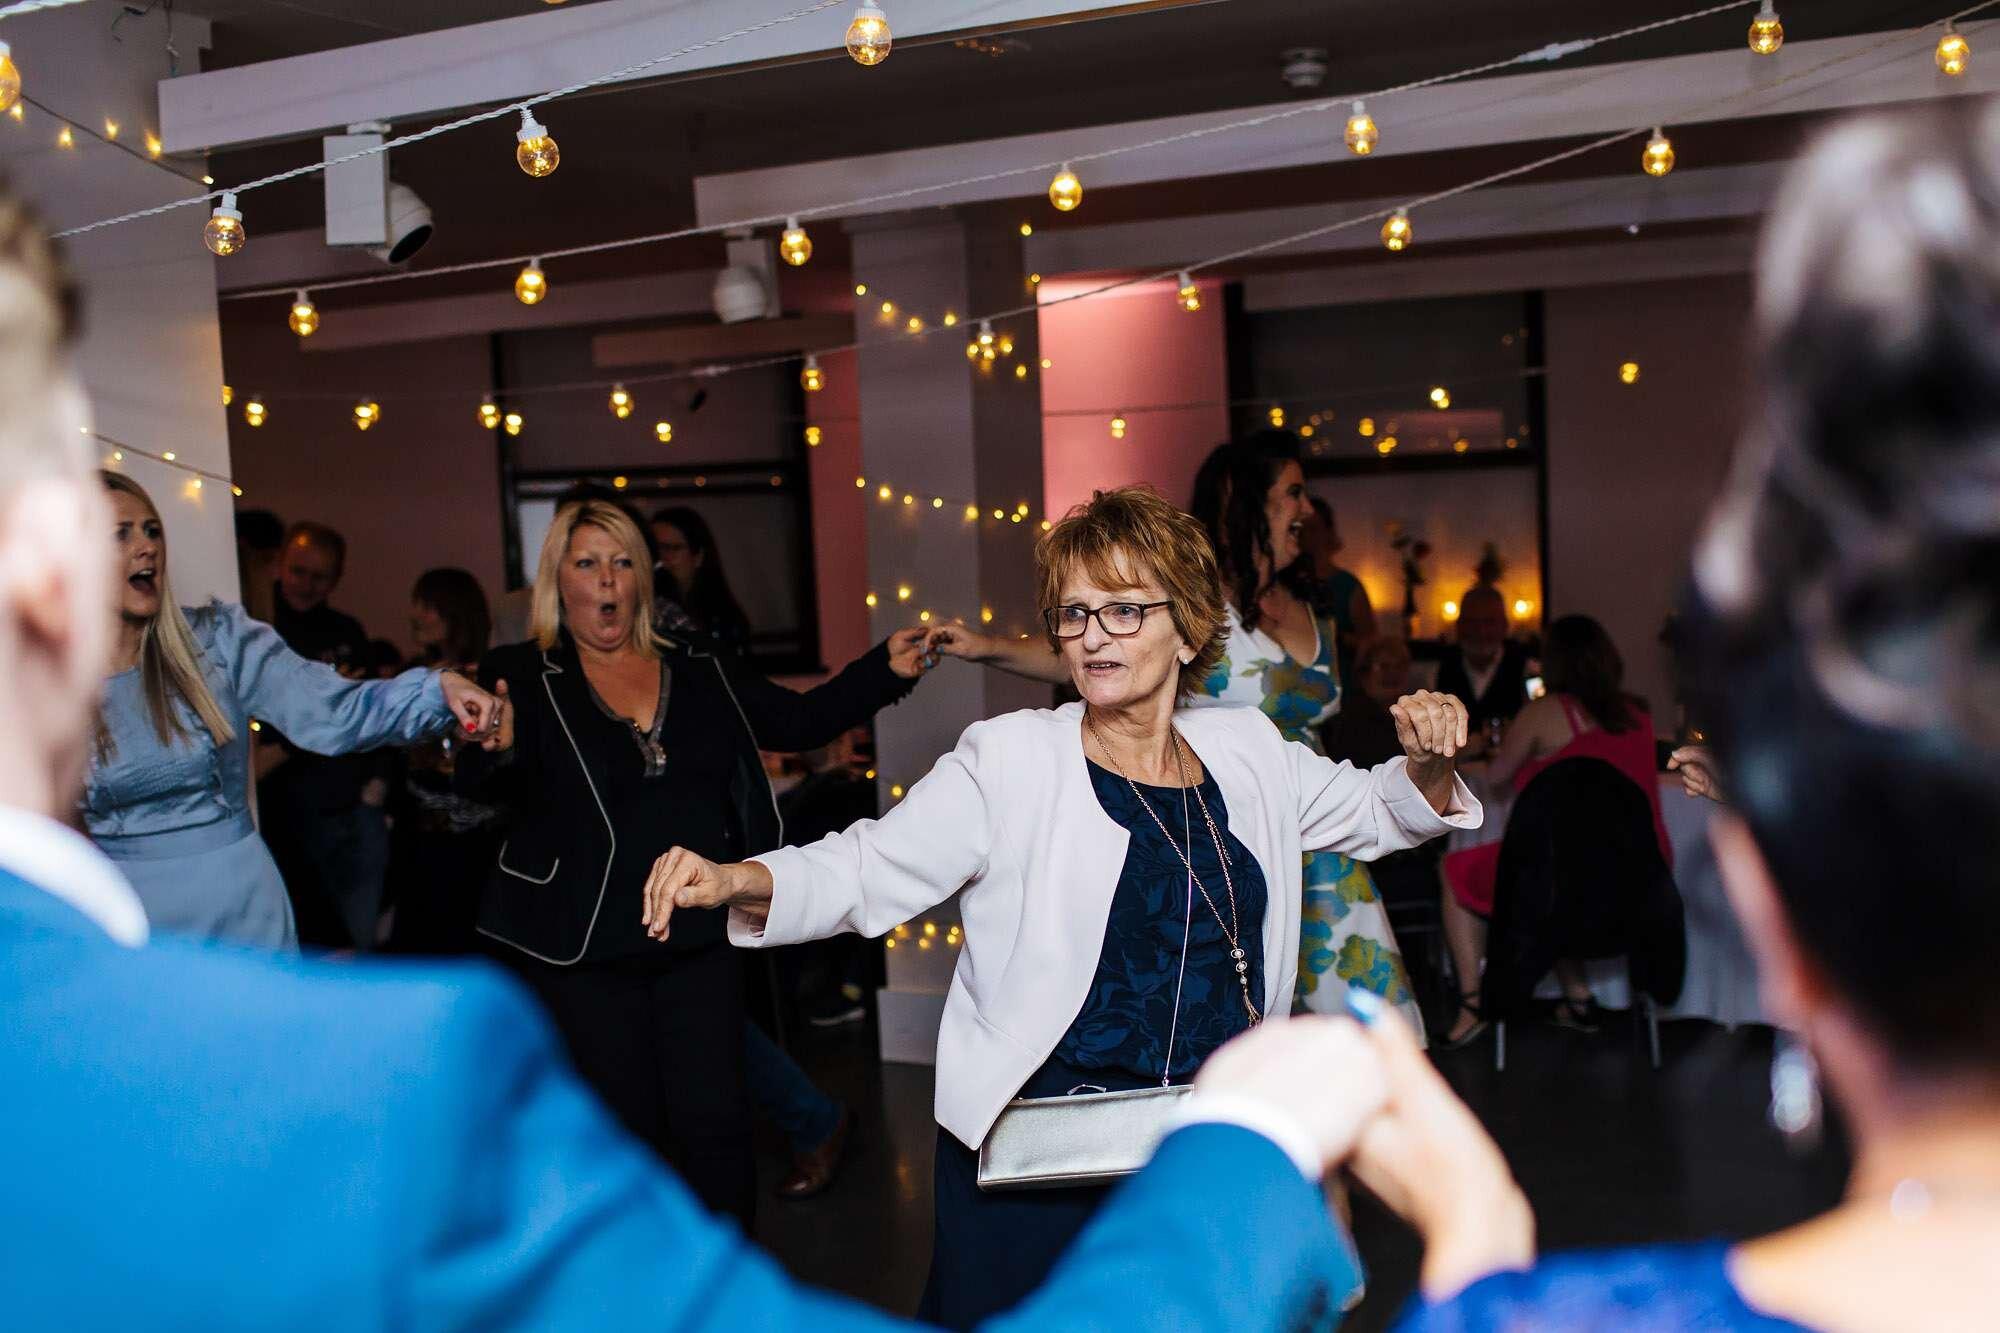 Wedding guests dancing at The Tetley Leeds